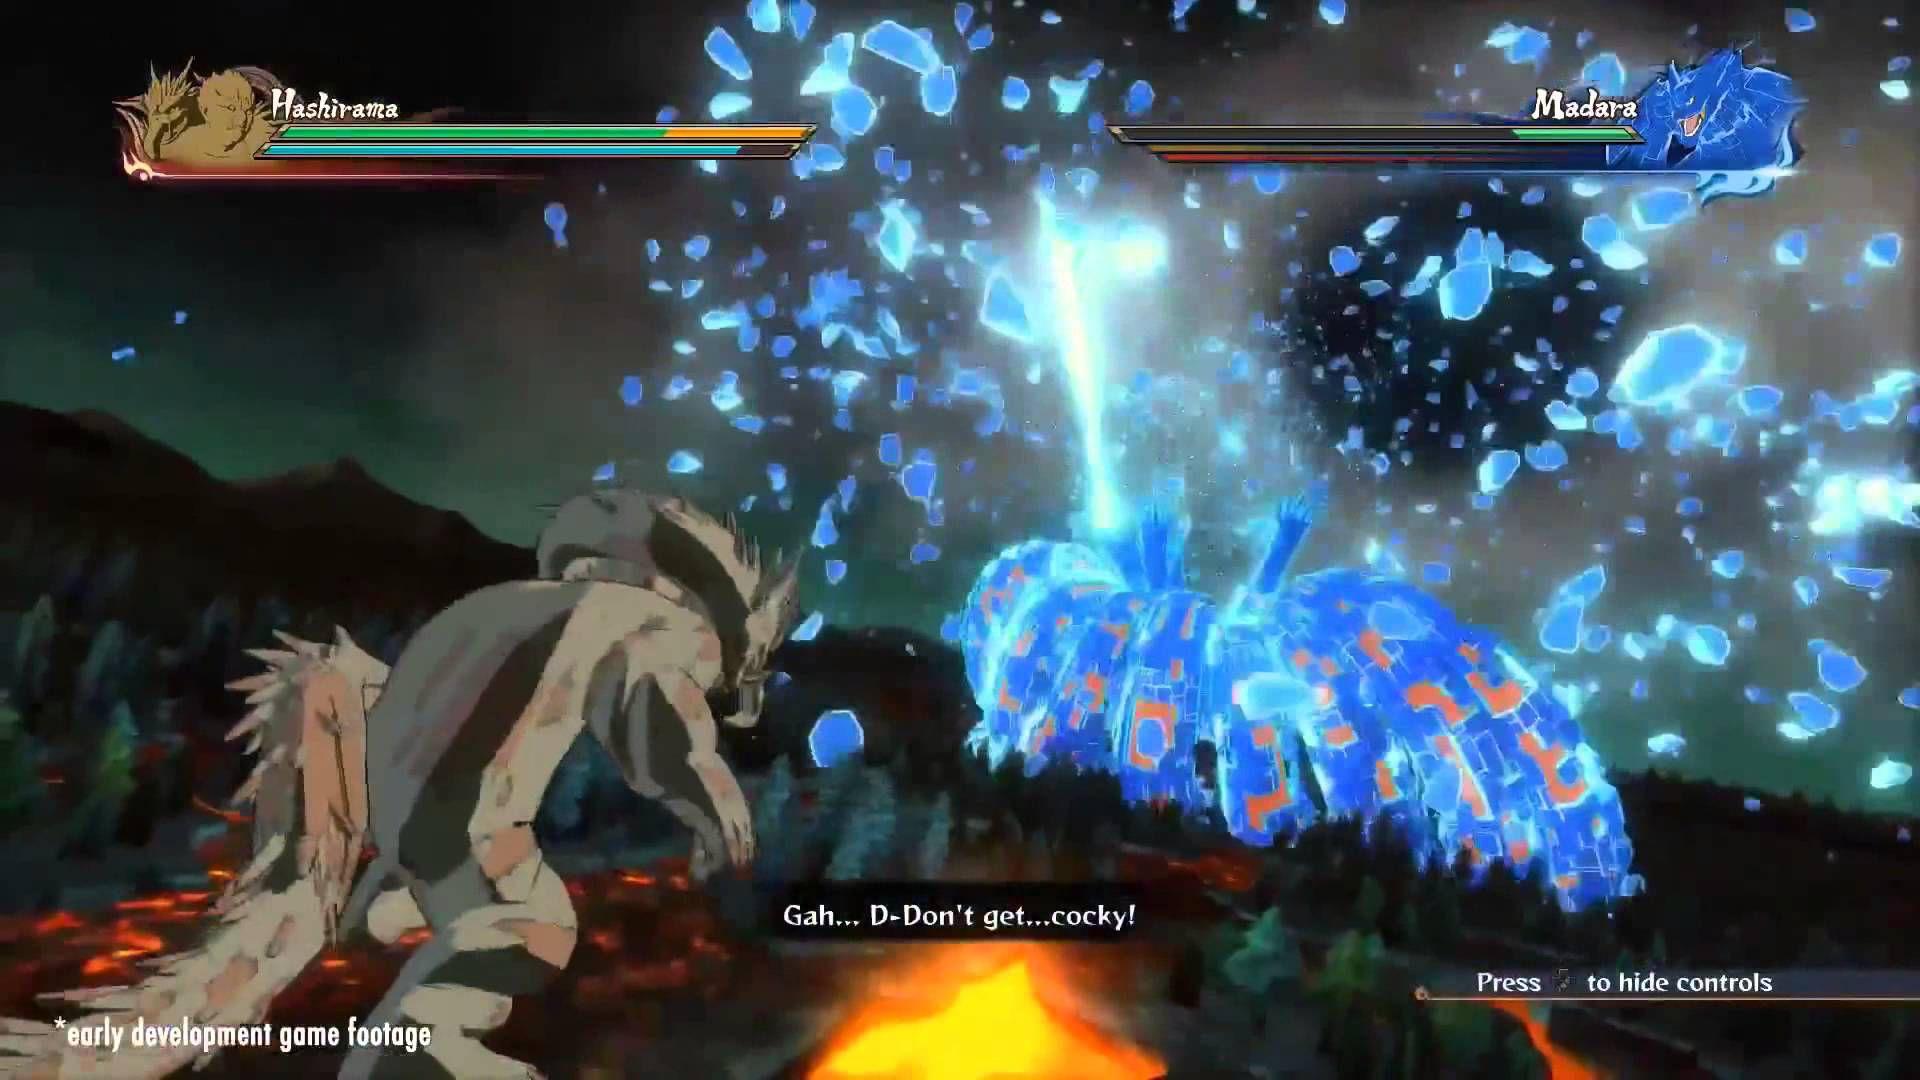 Naruto Shippuden: Ultimate Ninja Storm 4 [Video Game] | Kernel Ketchup